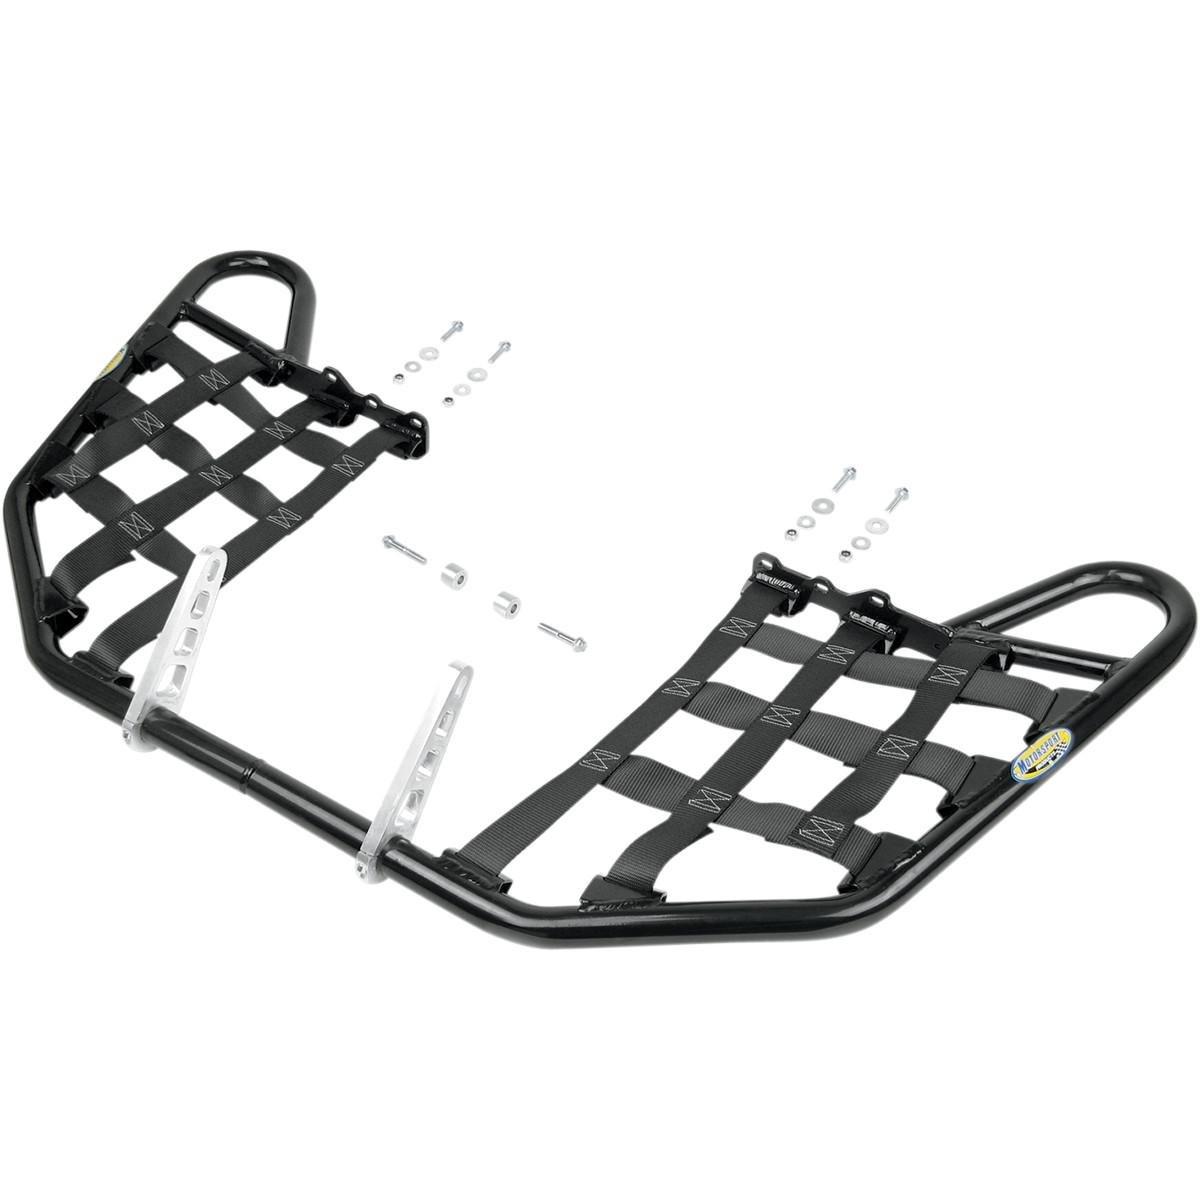 Black 81-2112 Motoworks EZ-FIT Nerf Bars